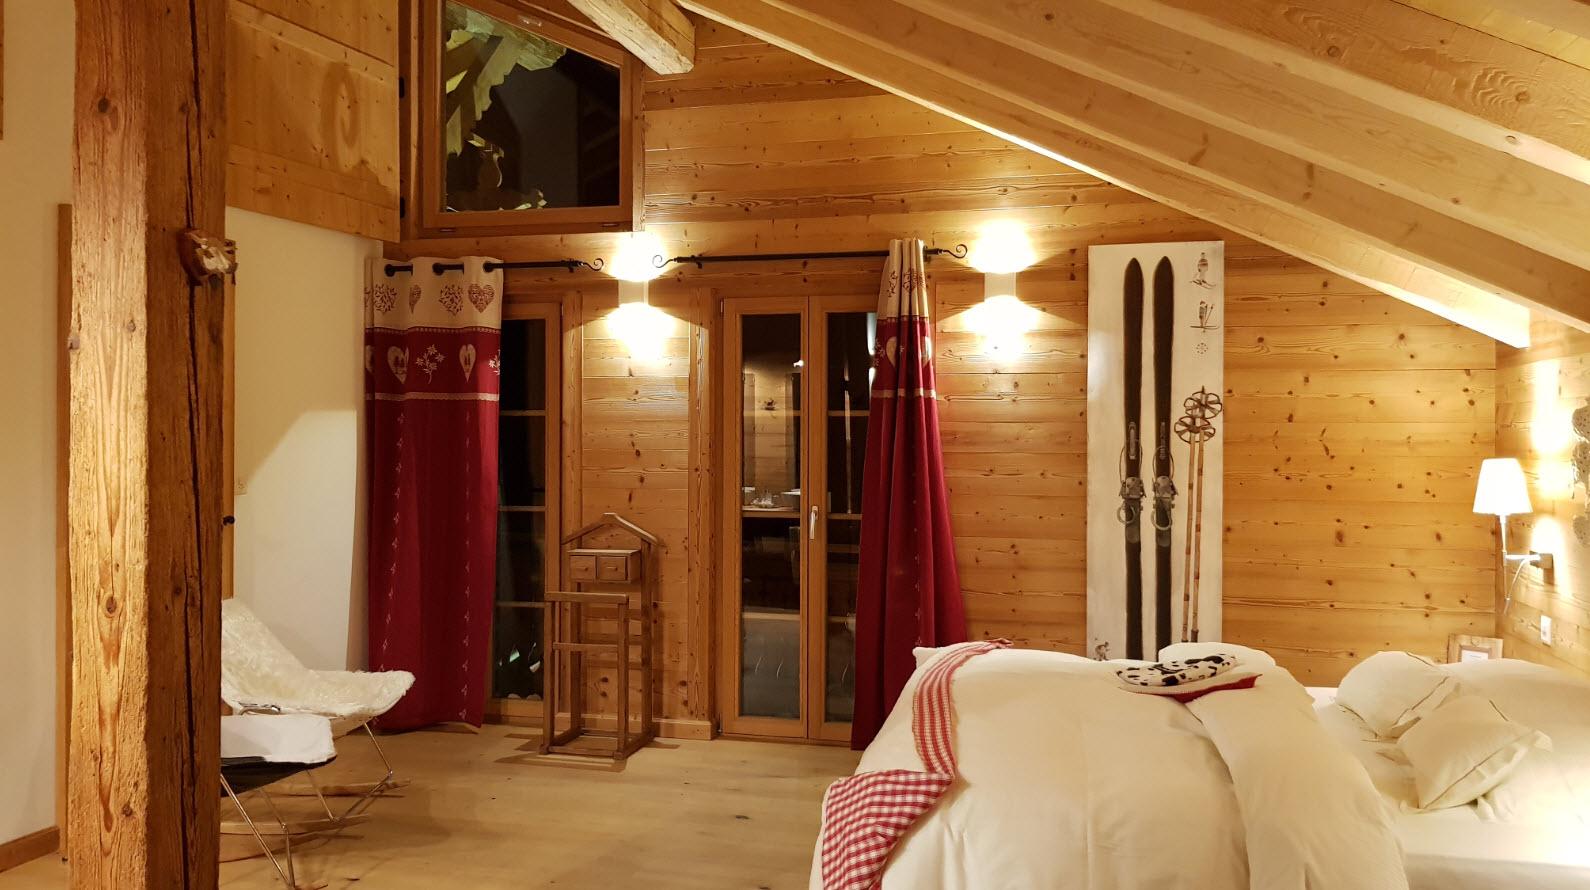 Hotel charme Valais